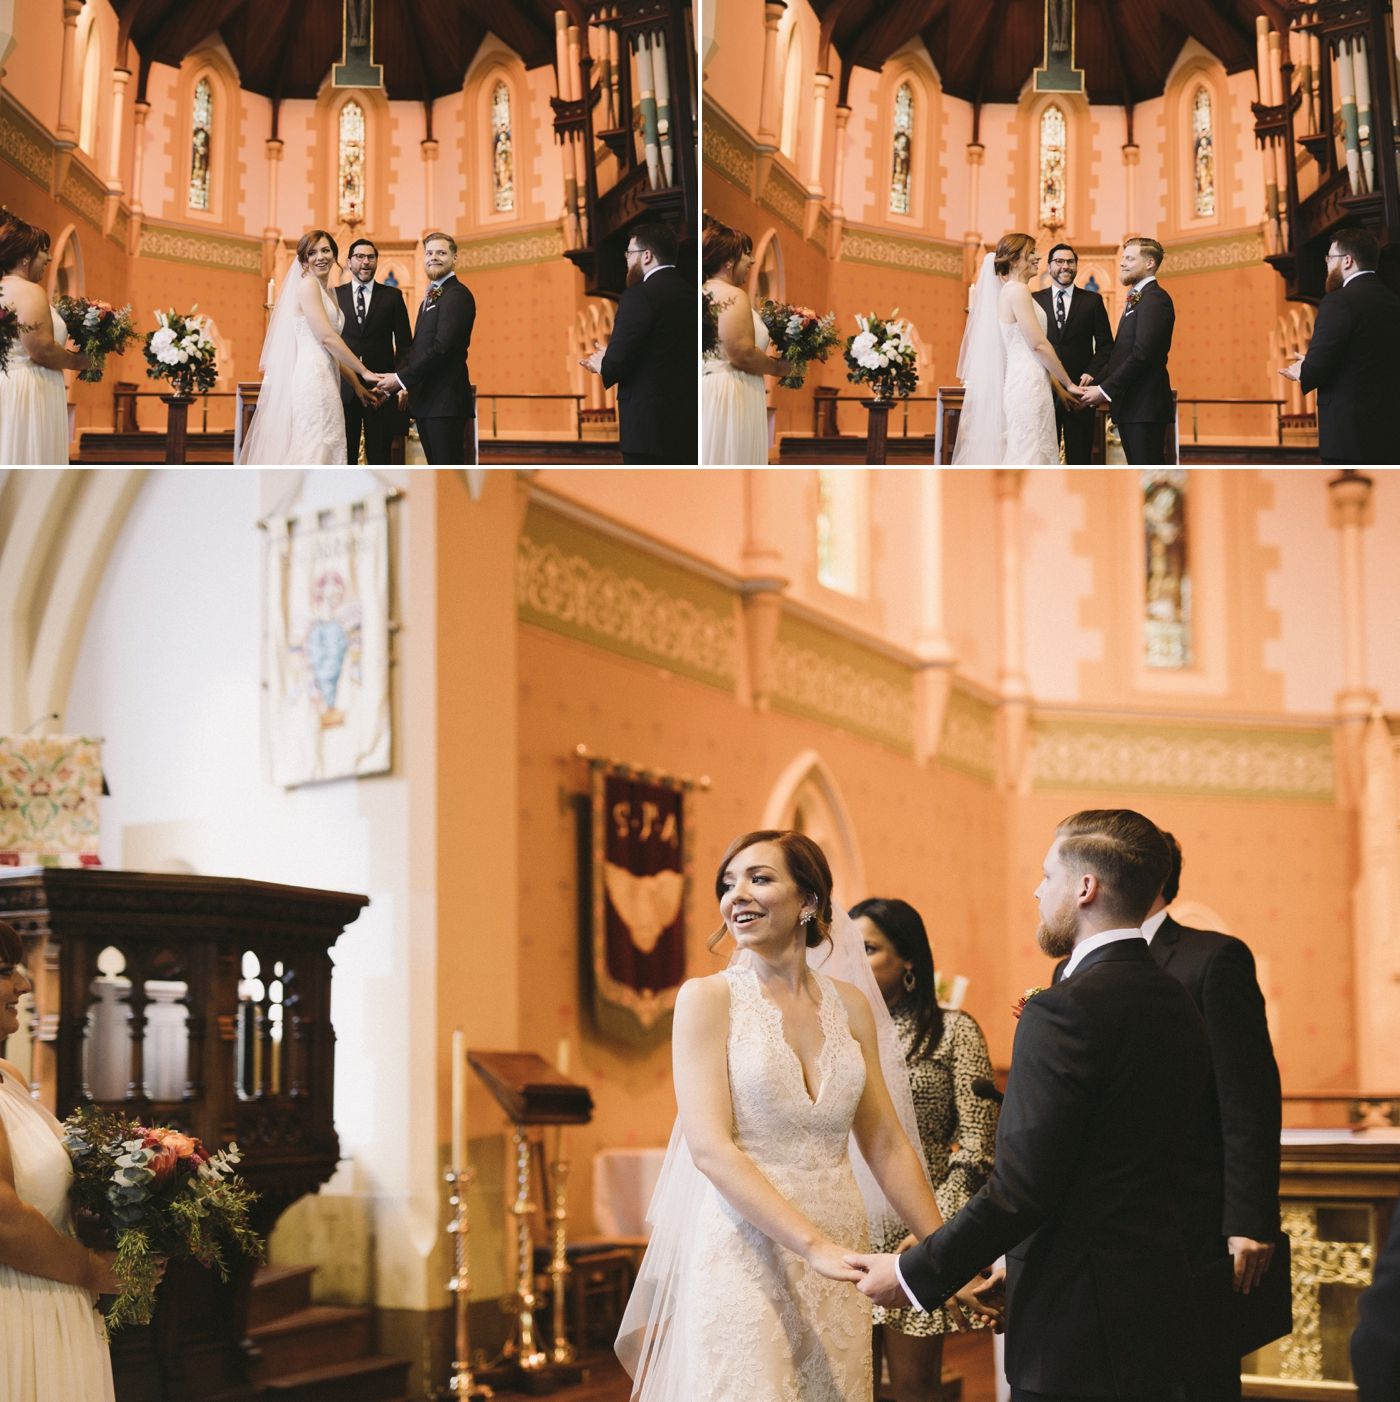 Erin & Ryan - Natural Wedding Photographer in Adelaide - Maximillians Wedding - Simple and Modern Wedding Photographer - Katherine Schultz - www.katherineschultzphotography.com_0024.jpg